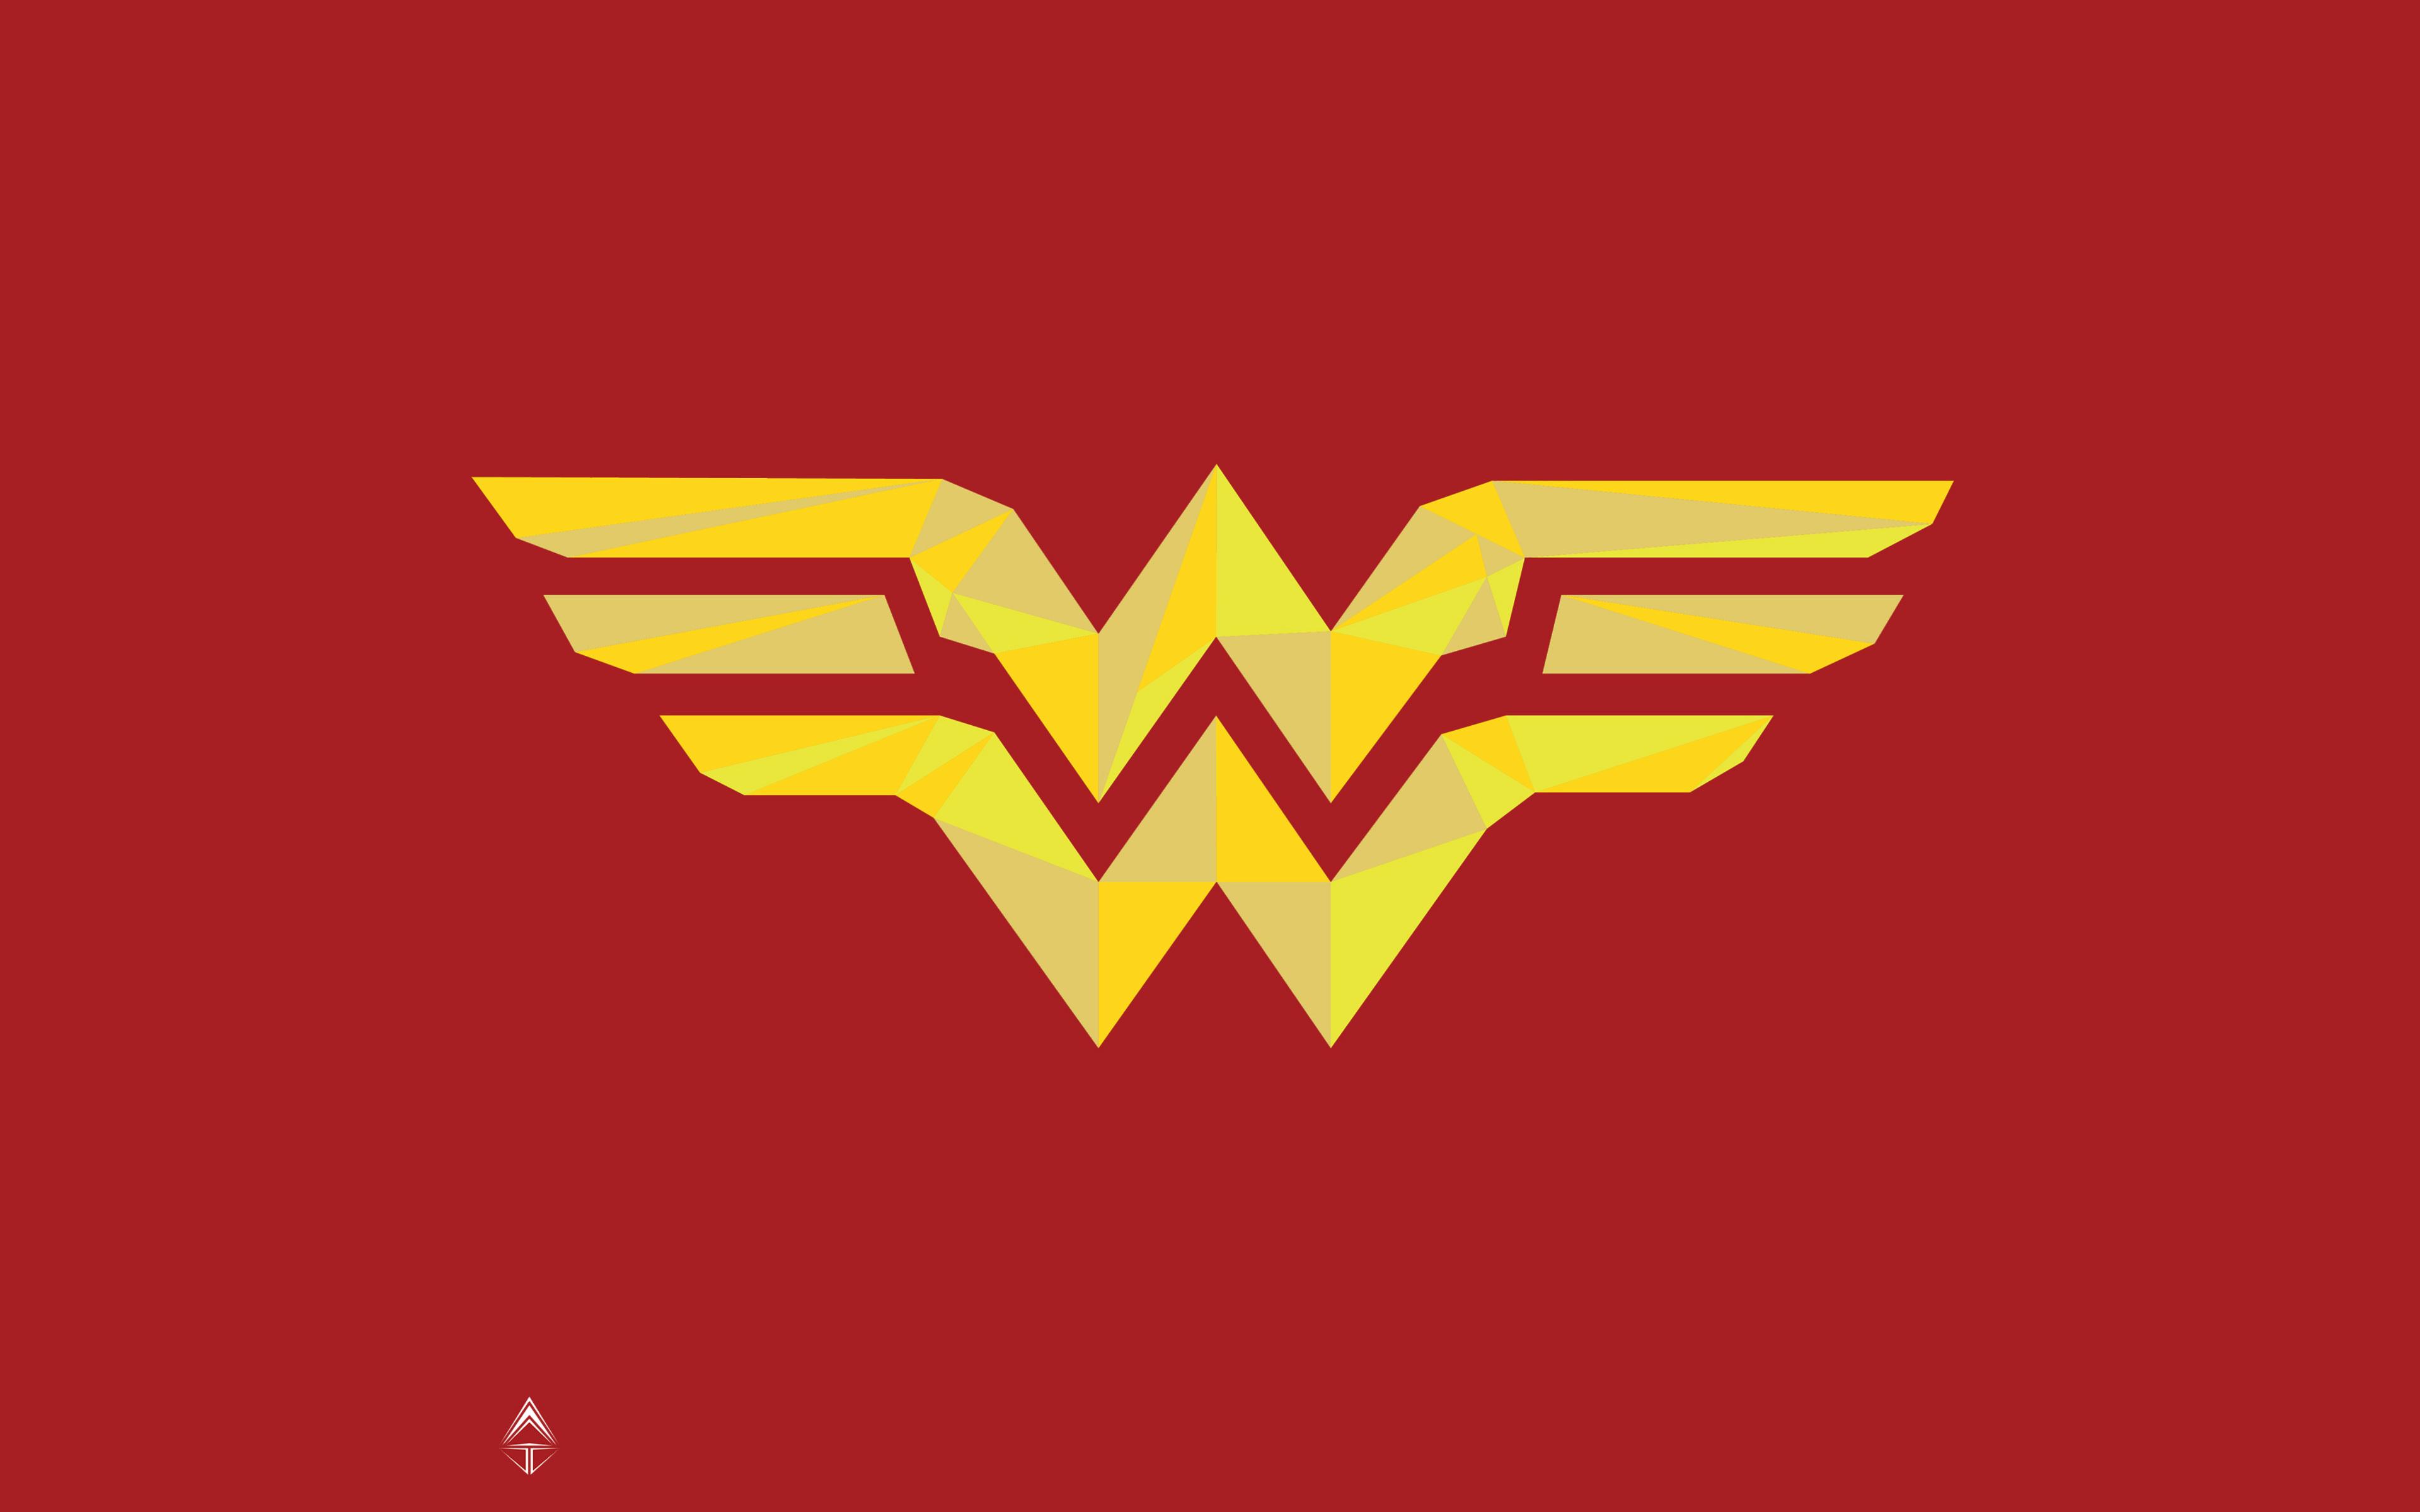 wonder-woman-logo-4k-artwork-py.jpg